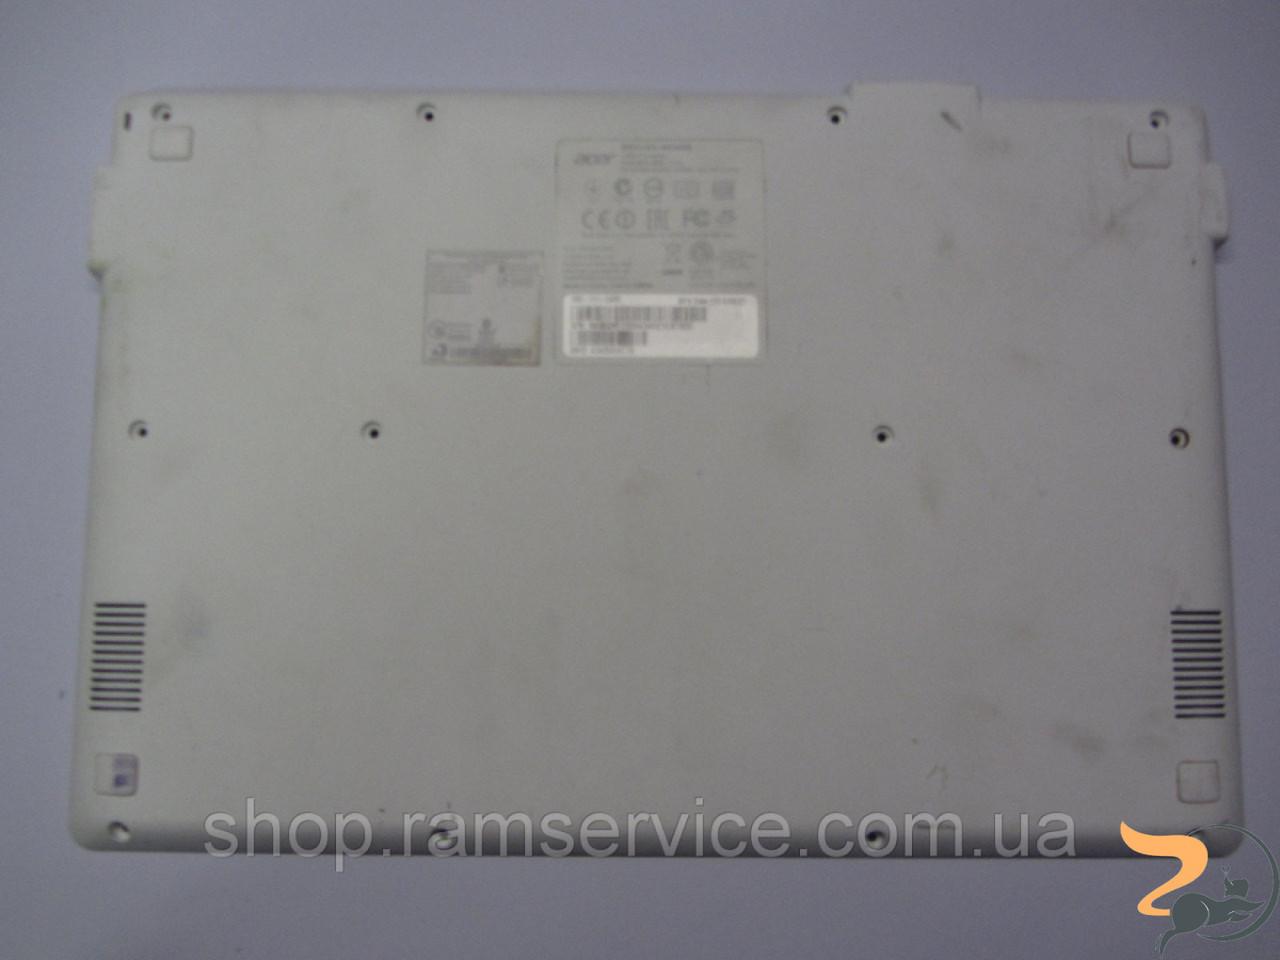 Нижня частина корпуса для ноутбука Acer CB3-111 ChromeBook, б/в